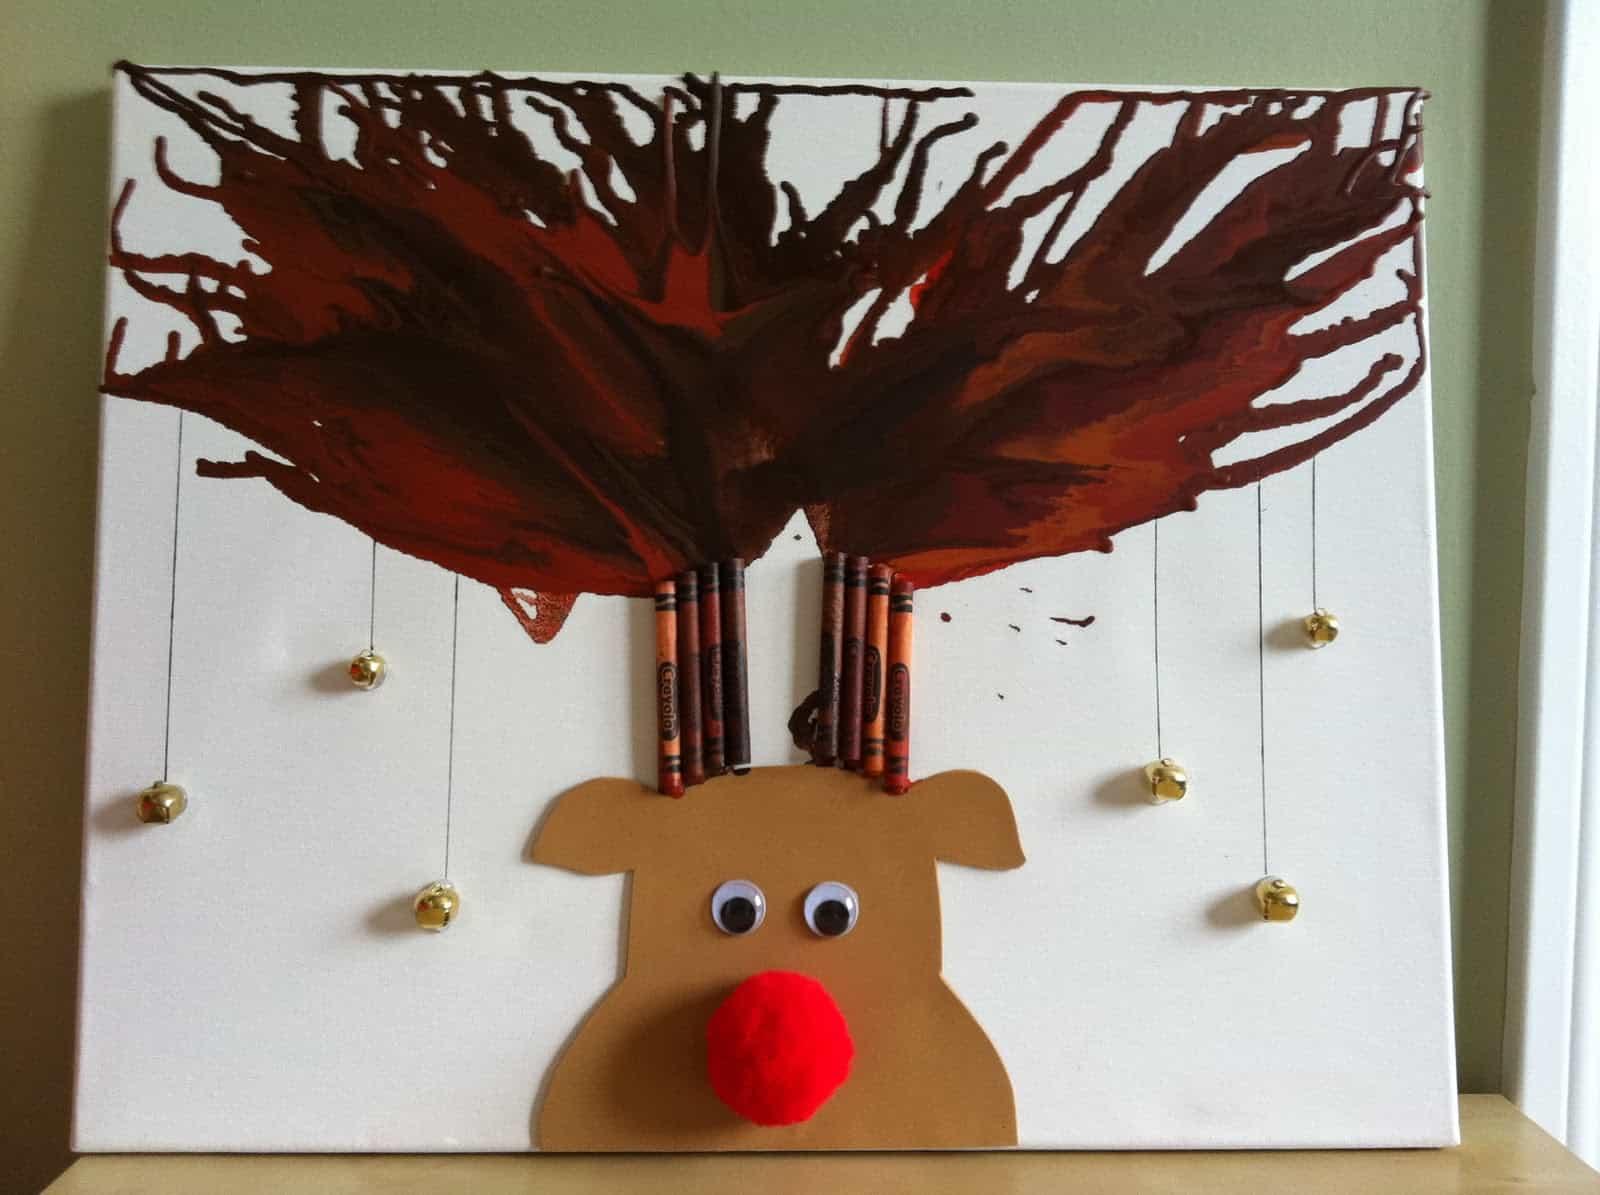 Jingle bell reindeer art